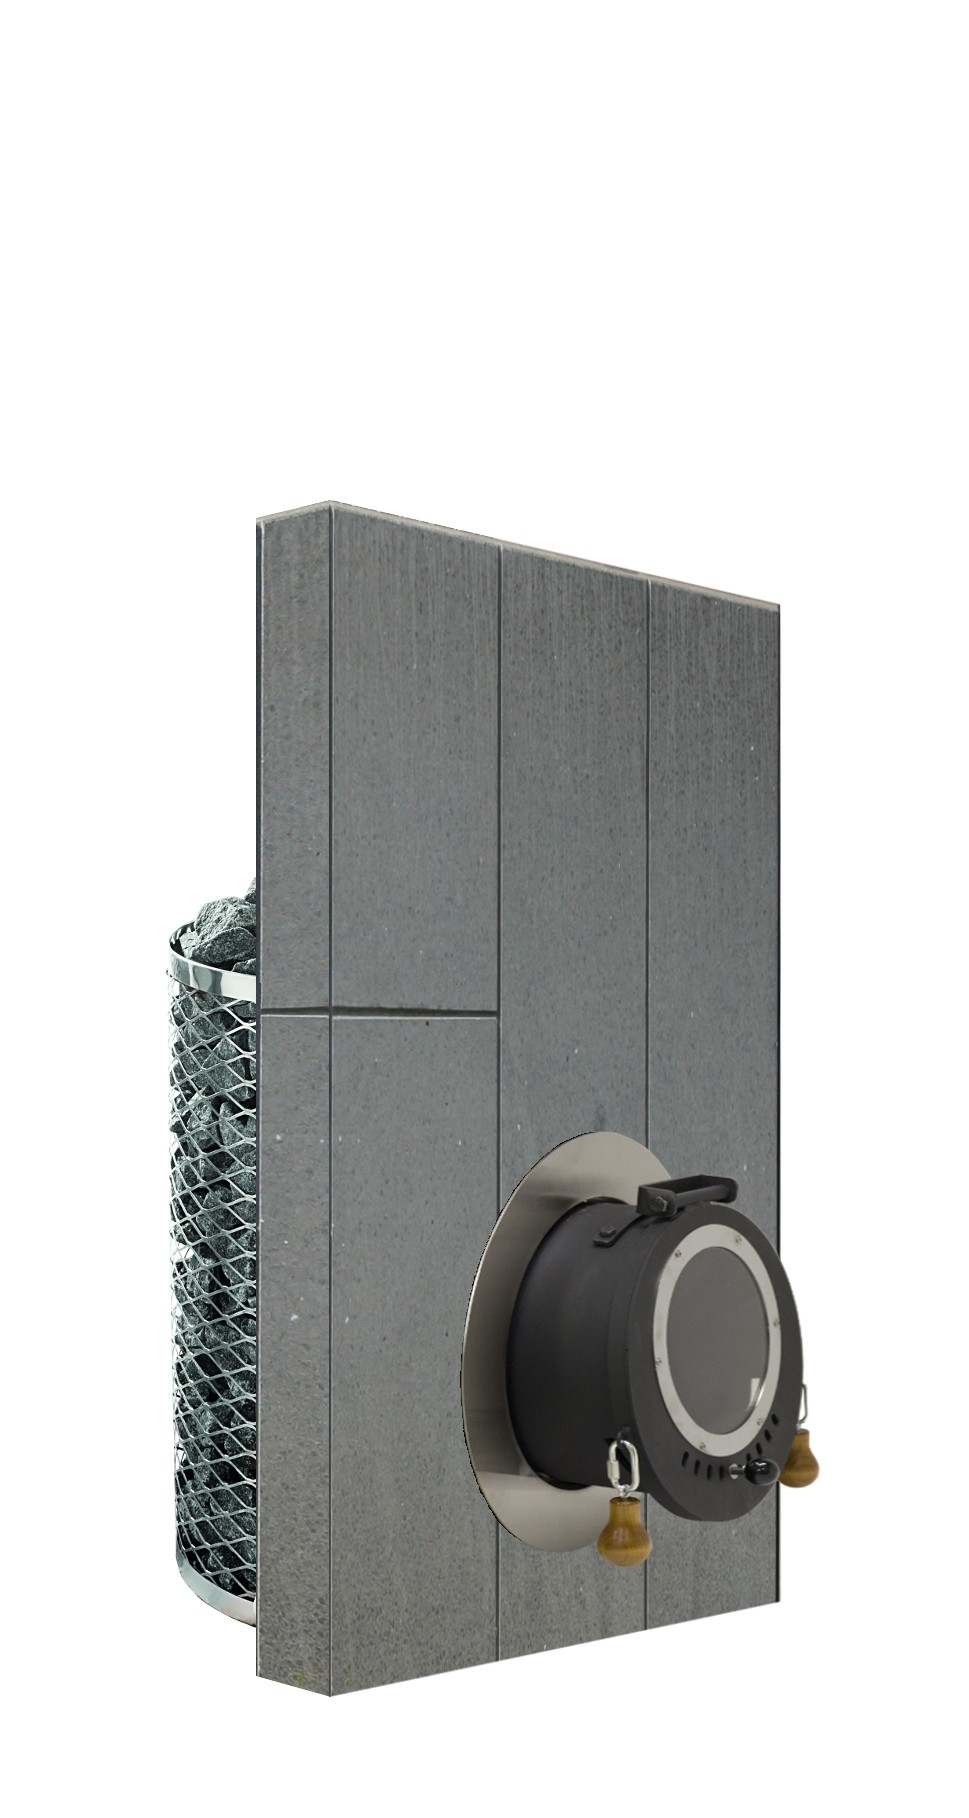 iki kuas wall au enbefeuerung. Black Bedroom Furniture Sets. Home Design Ideas